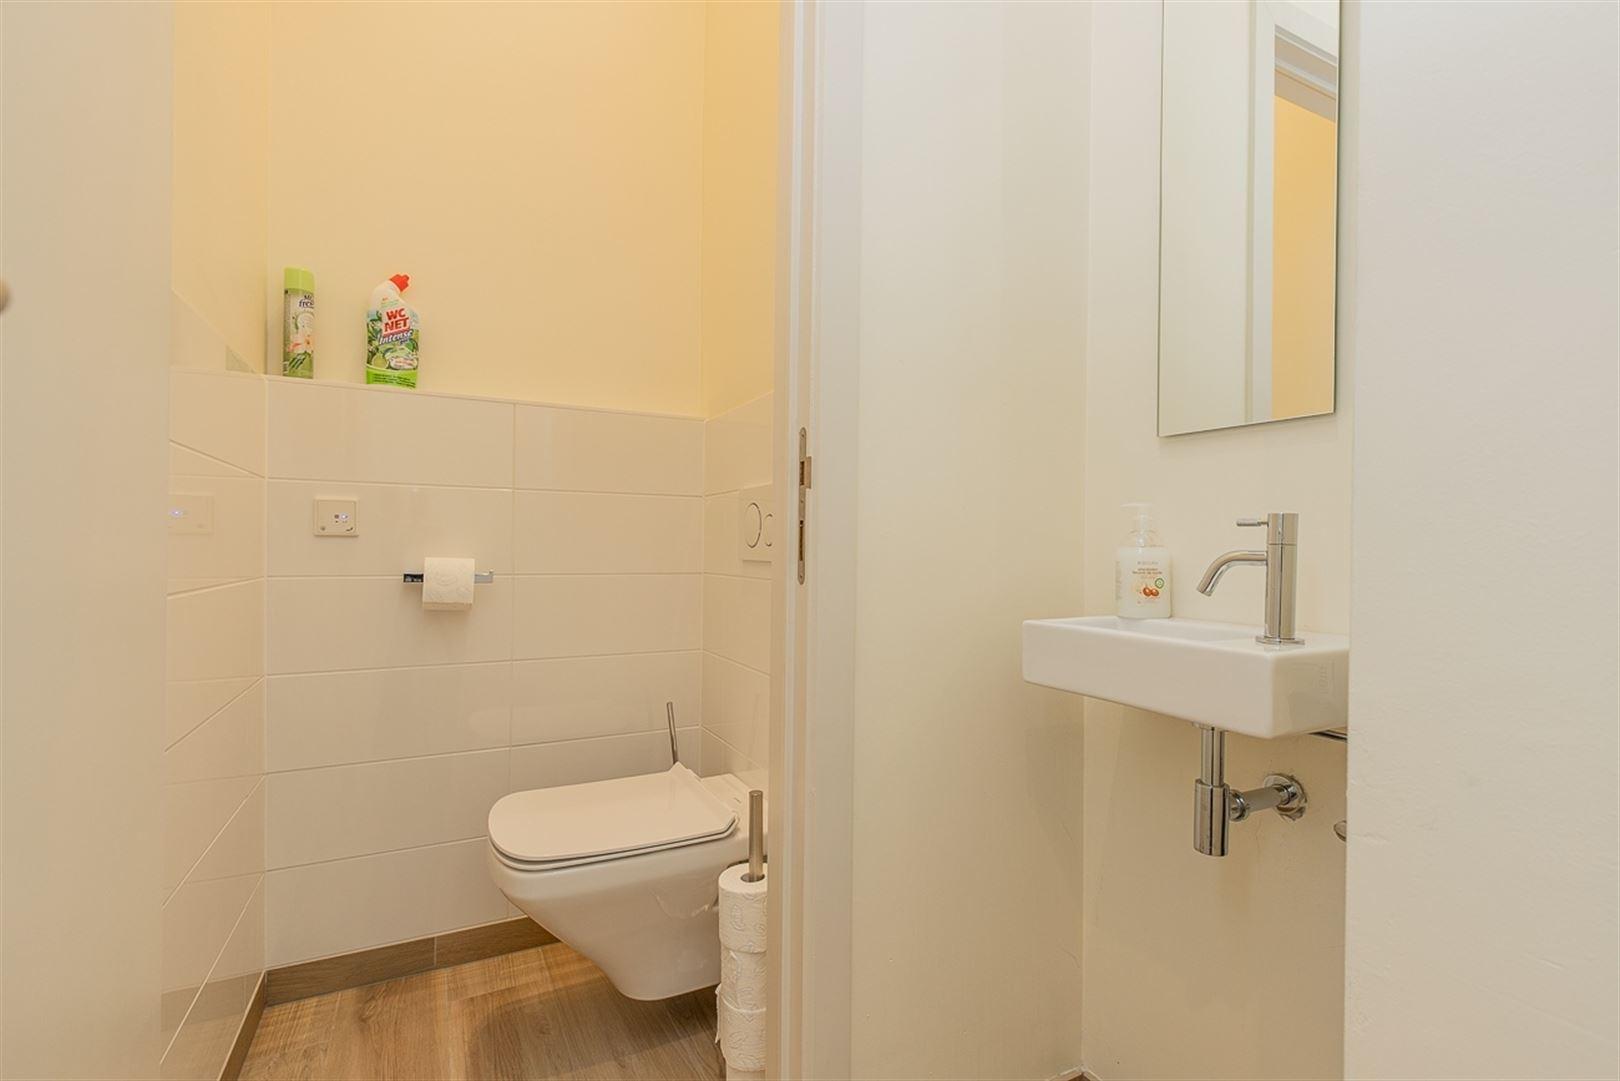 Foto 10 : Appartement te 9200 DENDERMONDE (België) - Prijs € 299.000